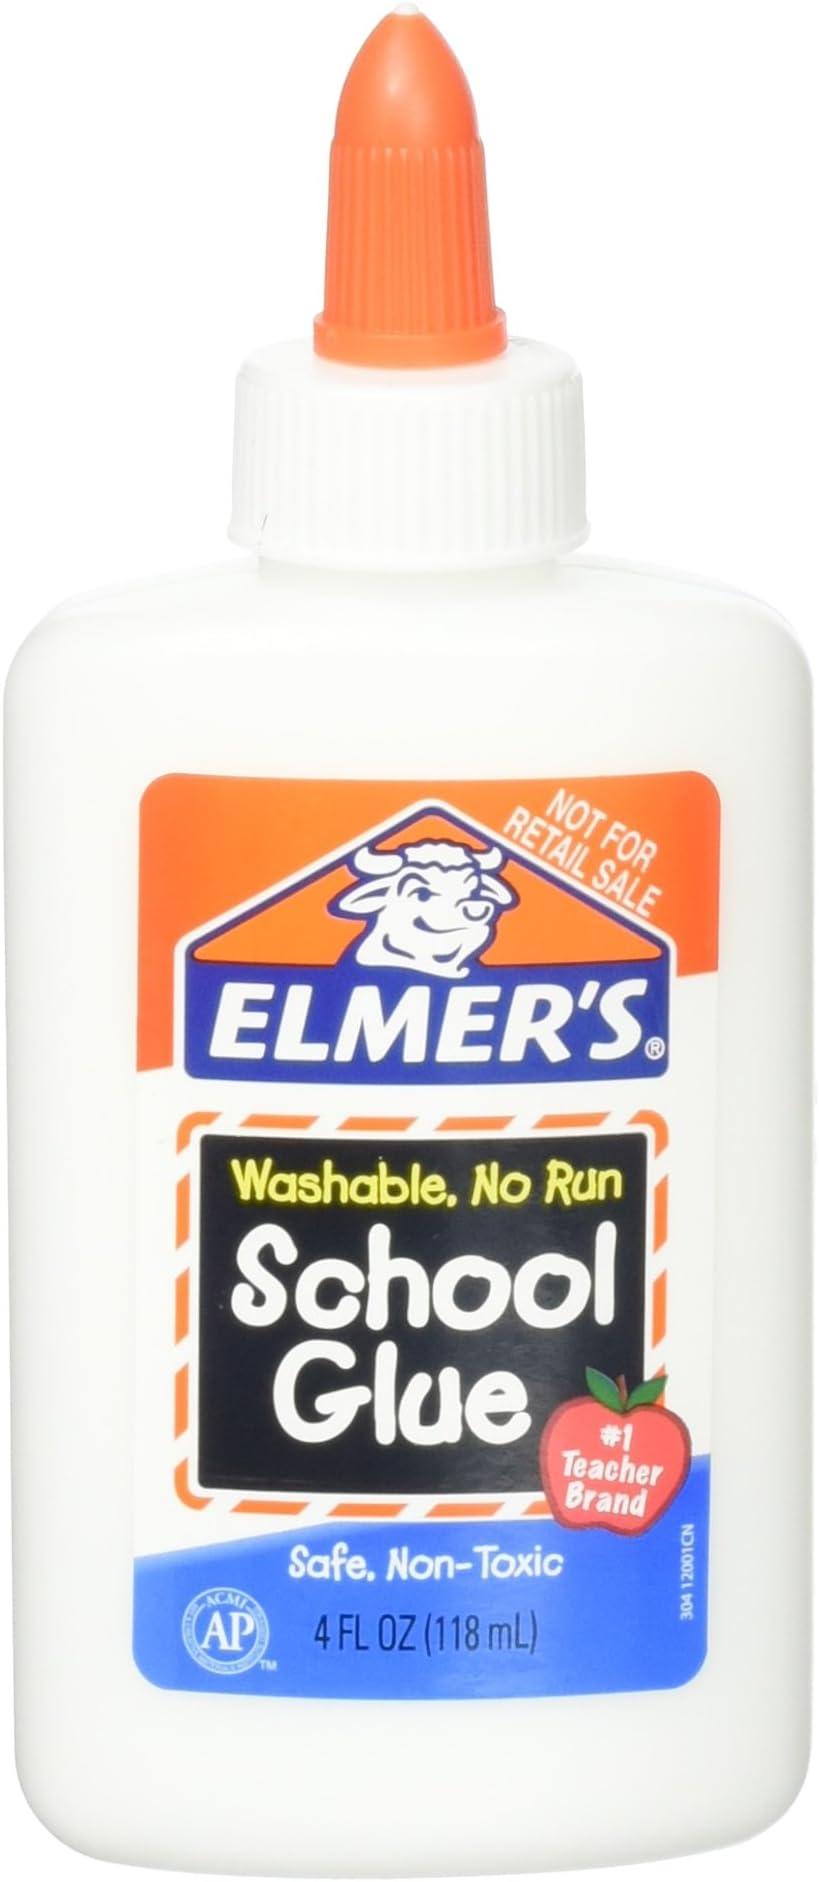 Elmer's Washable No Run School Glue, 4 Ounces, White and Dries Clear